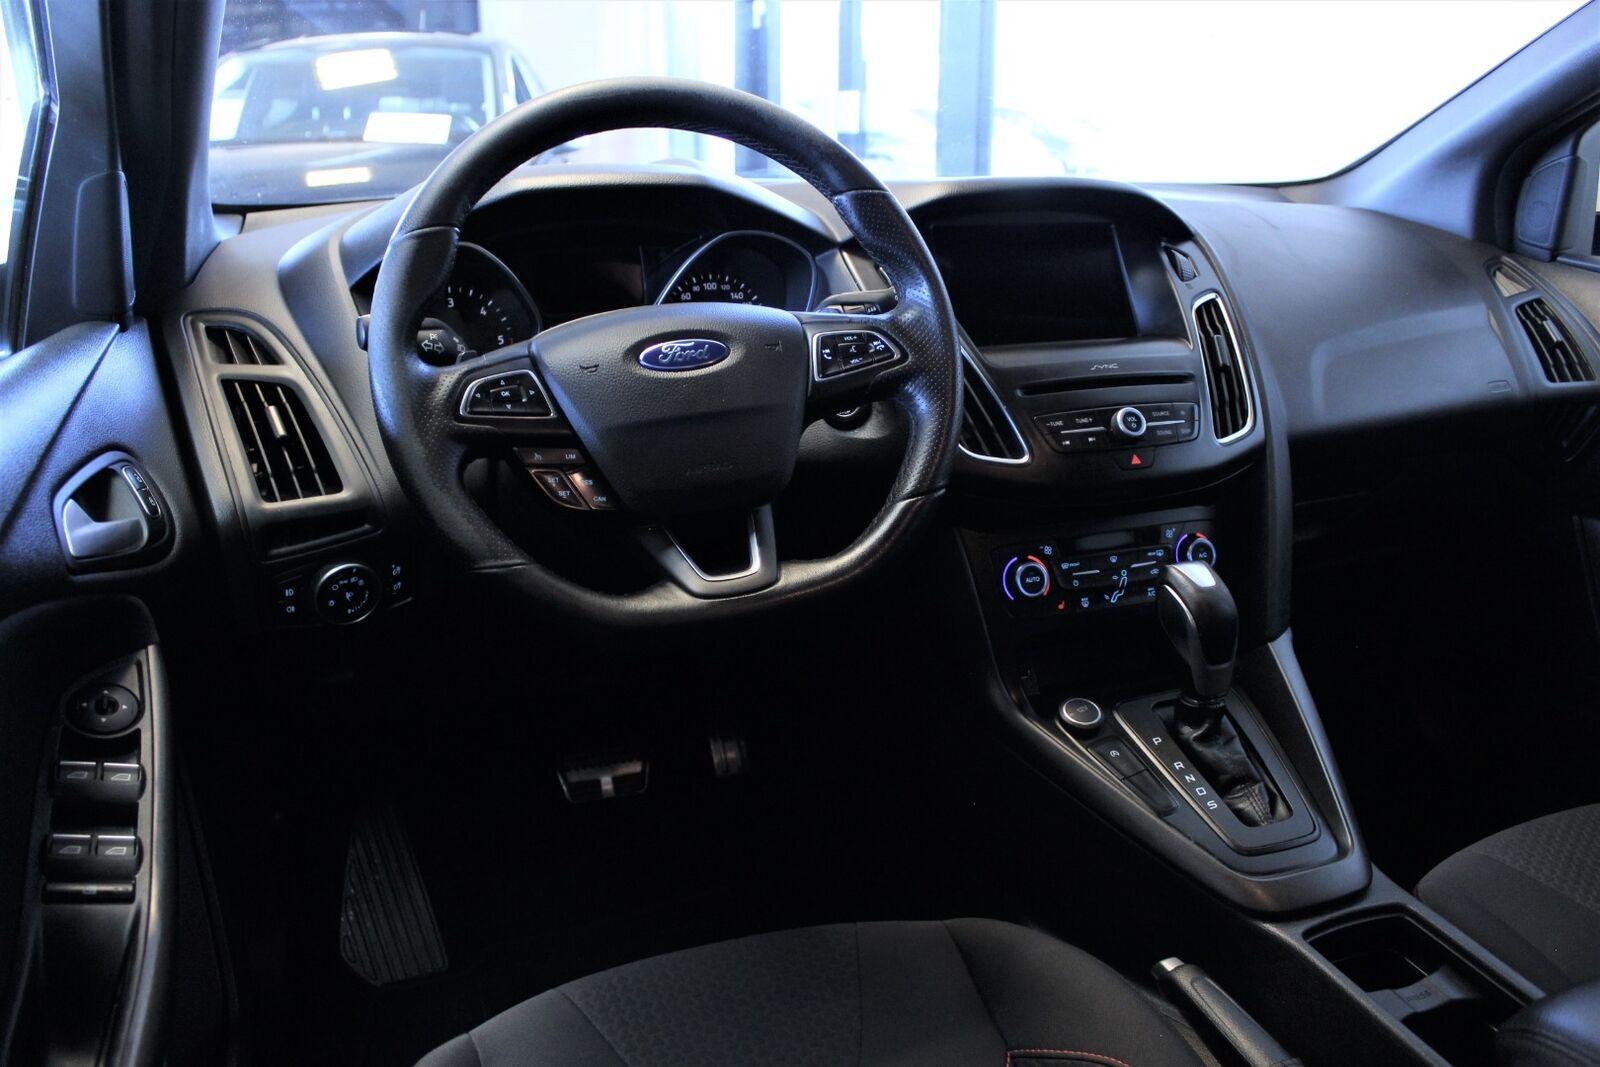 Ford Focus 1,5 TDCi 120 ST-Line stc. aut. - billede 7